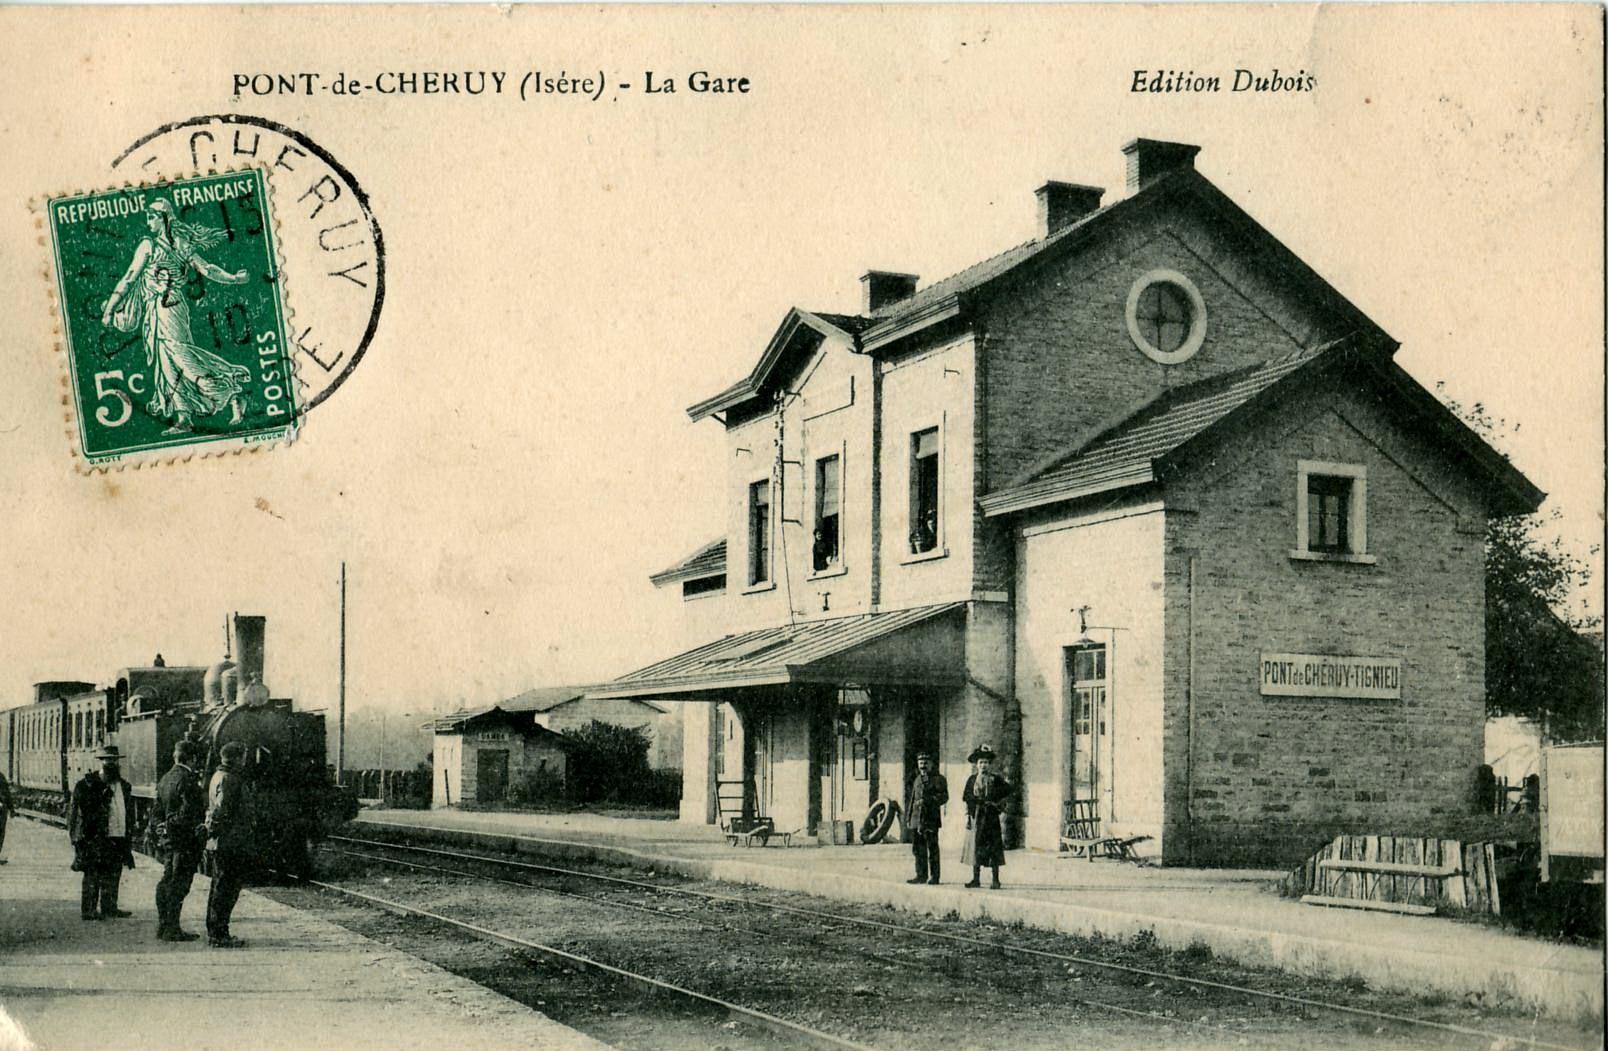 3_Dubois_-_PONT_DE_CHERUY_-_La_Gare_193_10